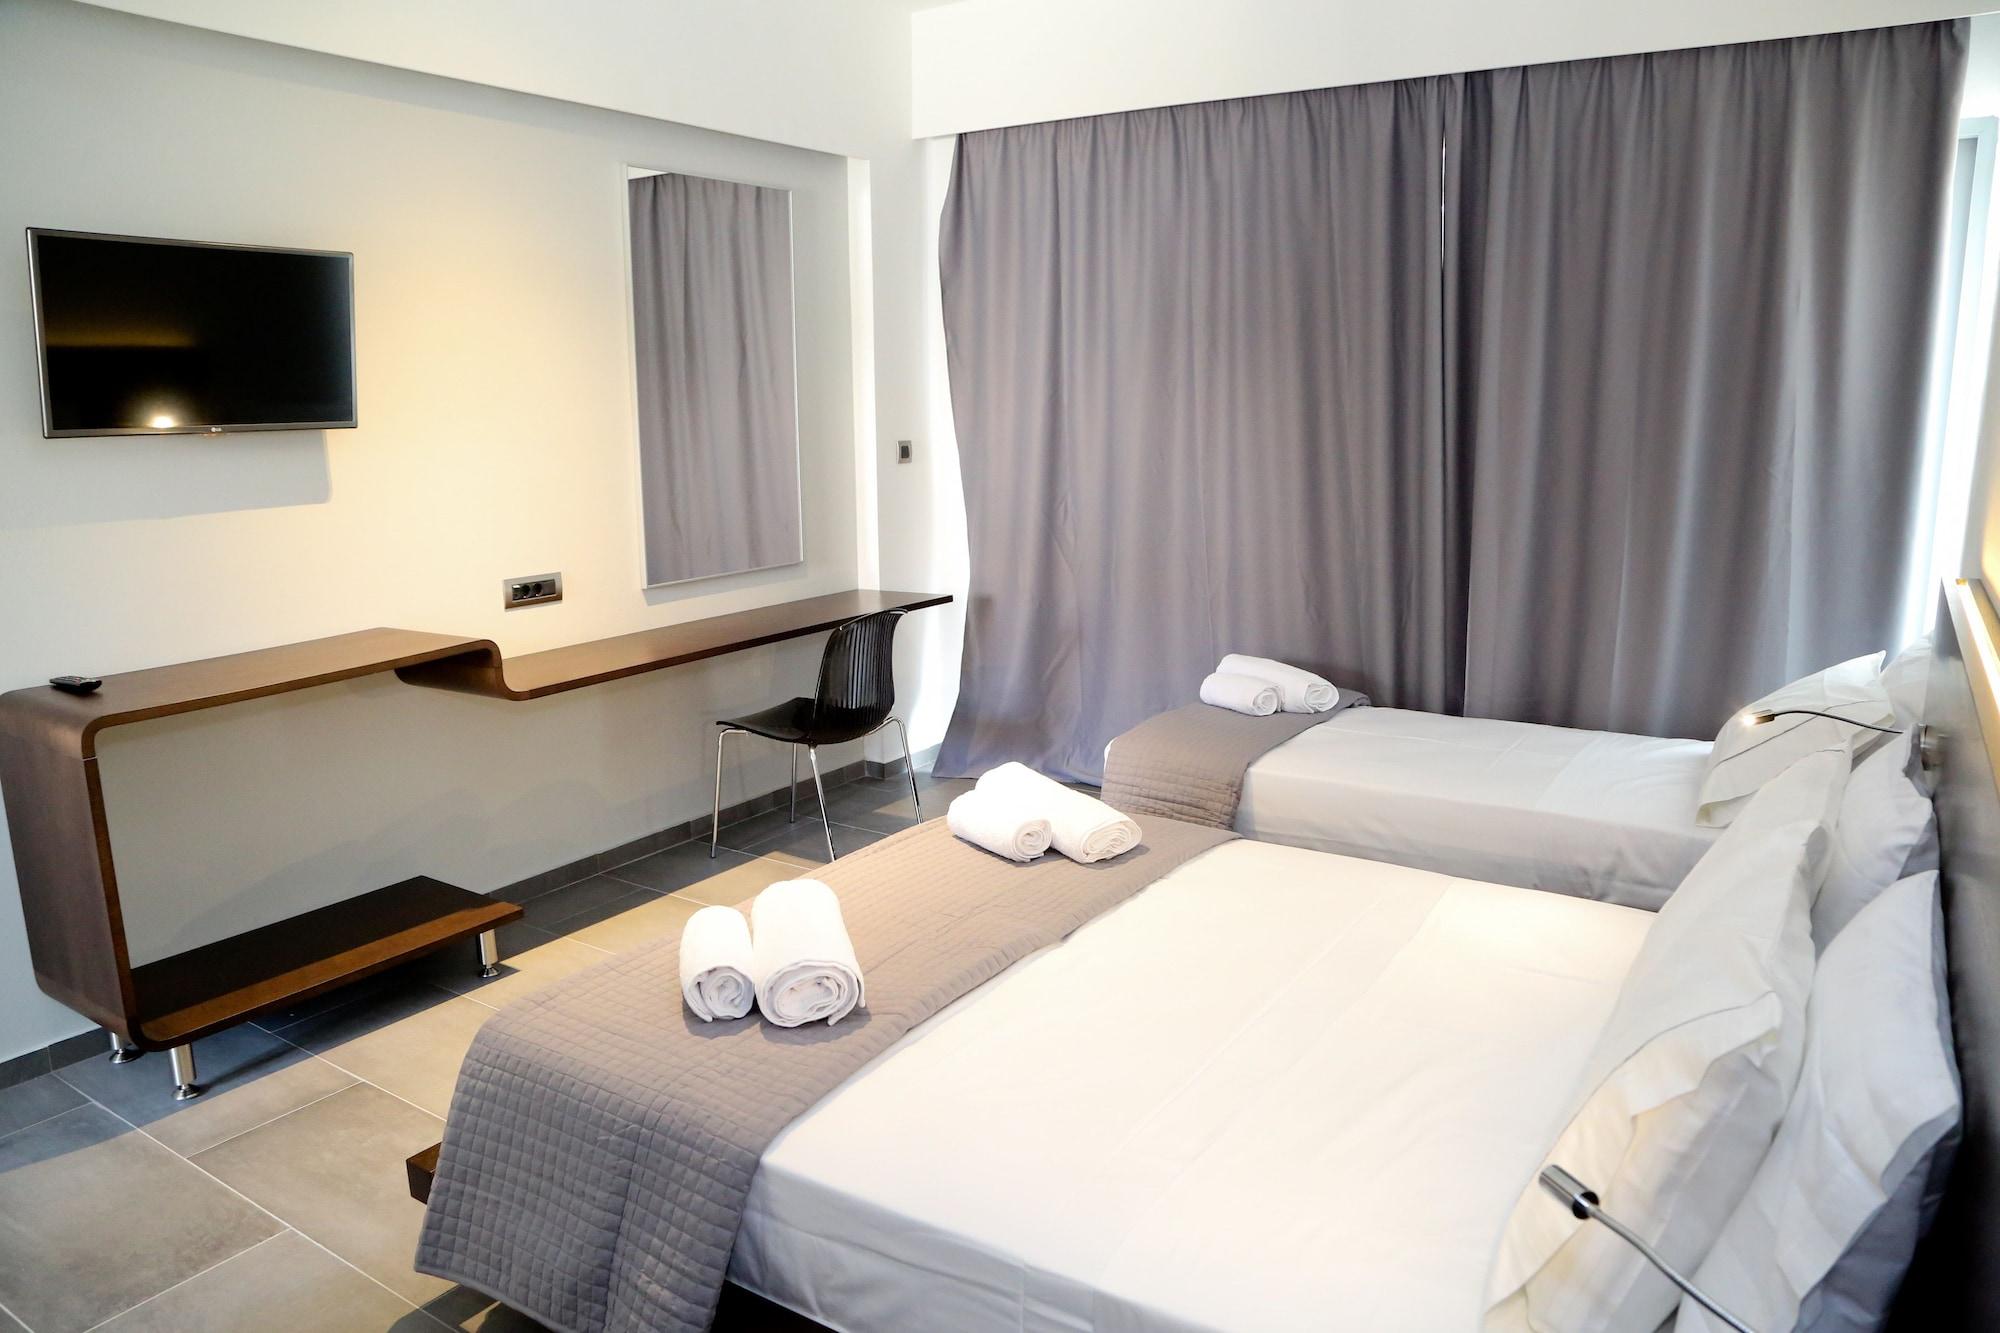 Megara Hotel, Attica